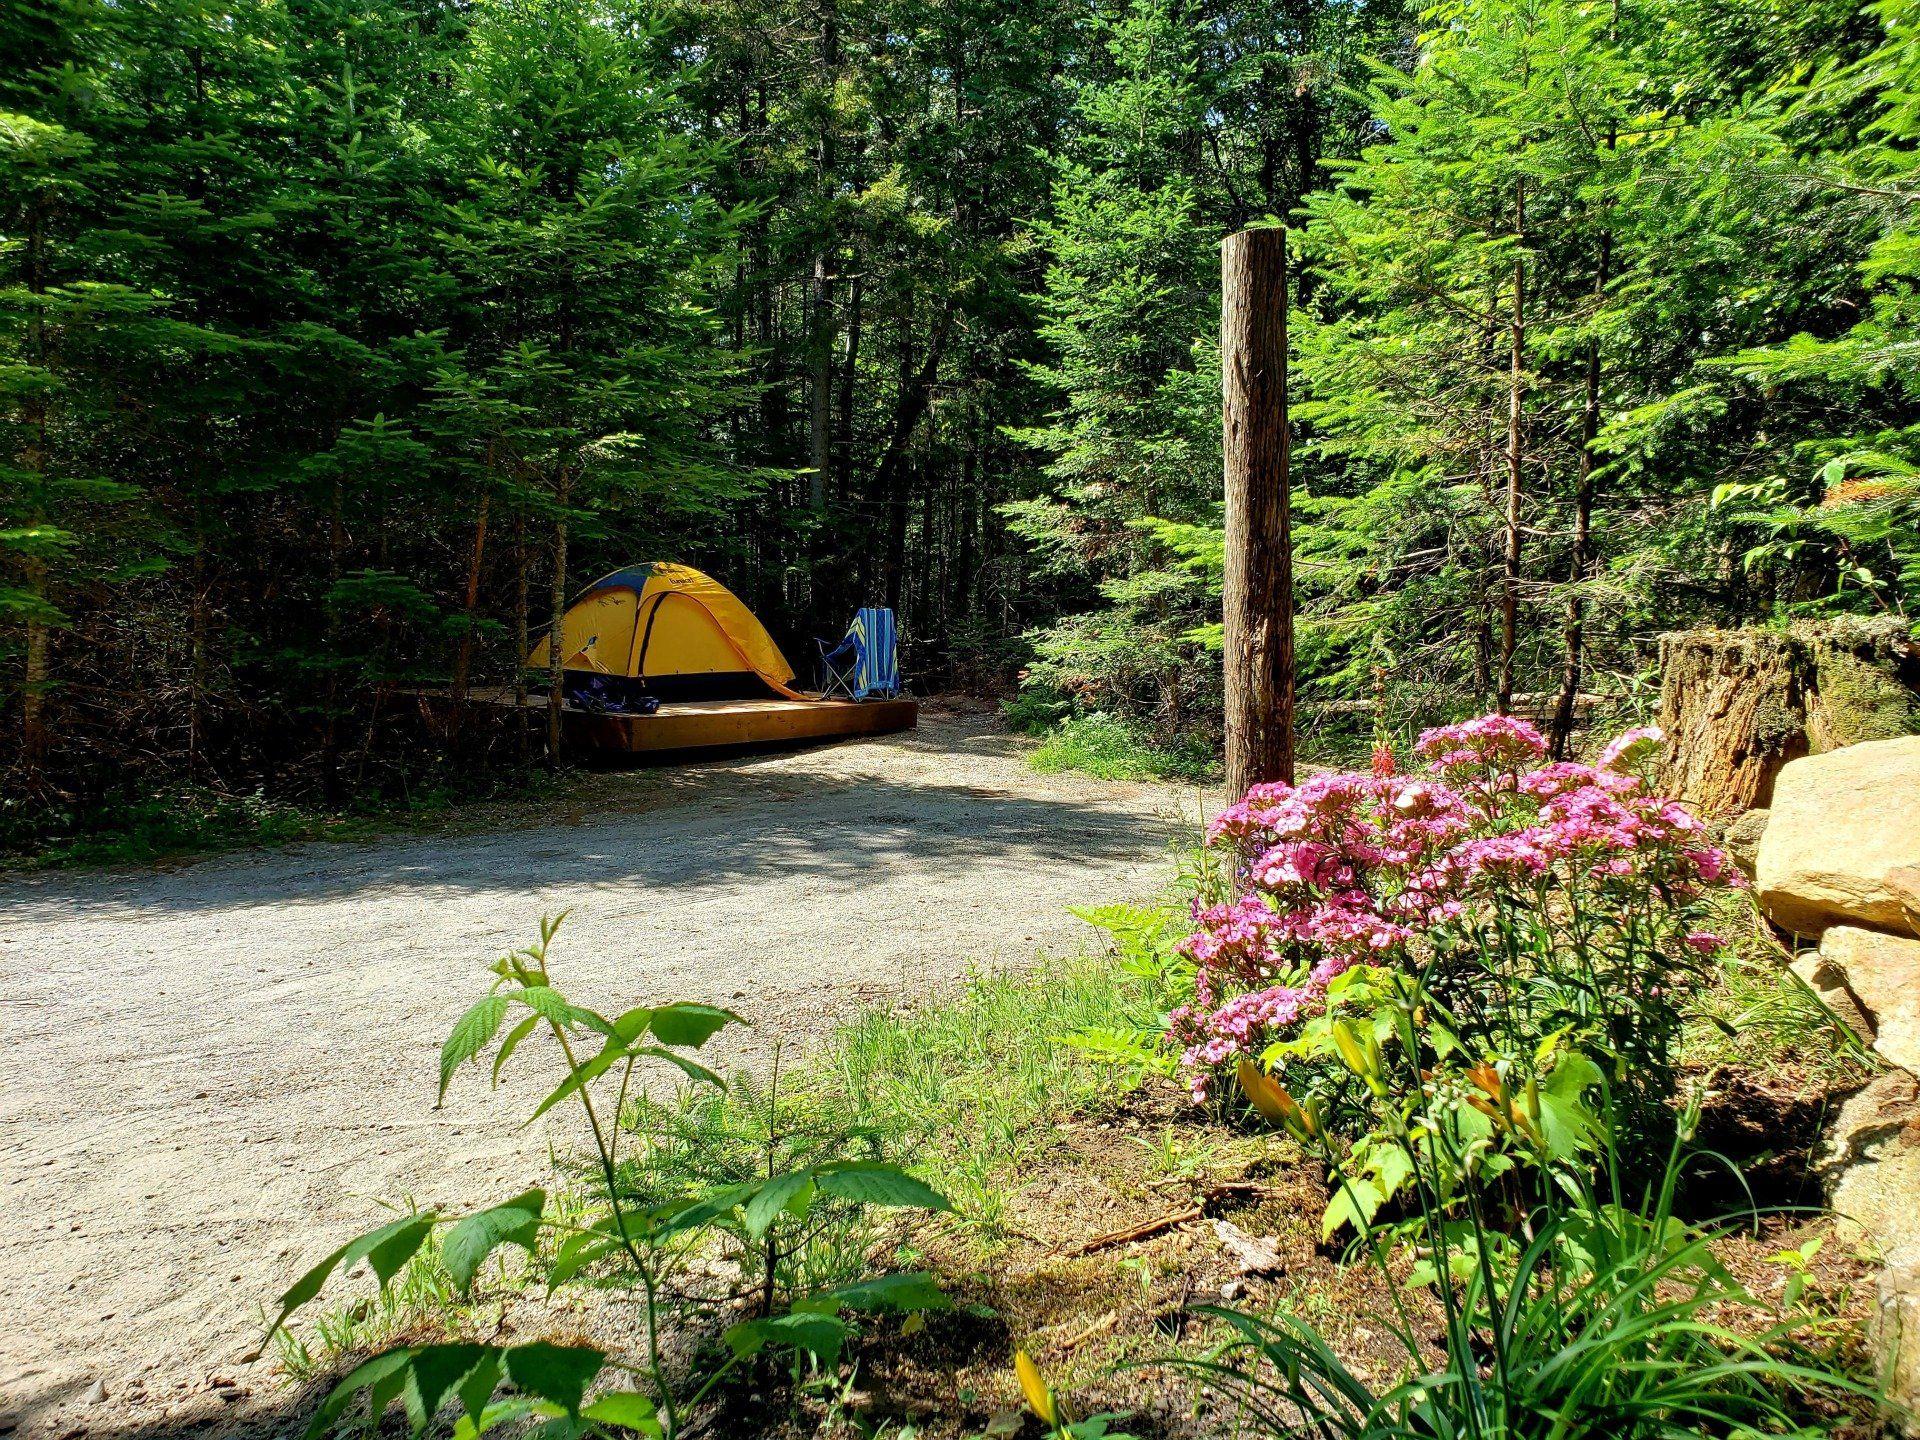 Tent Site Rentals Near Burke VT - Newark Camping Sites